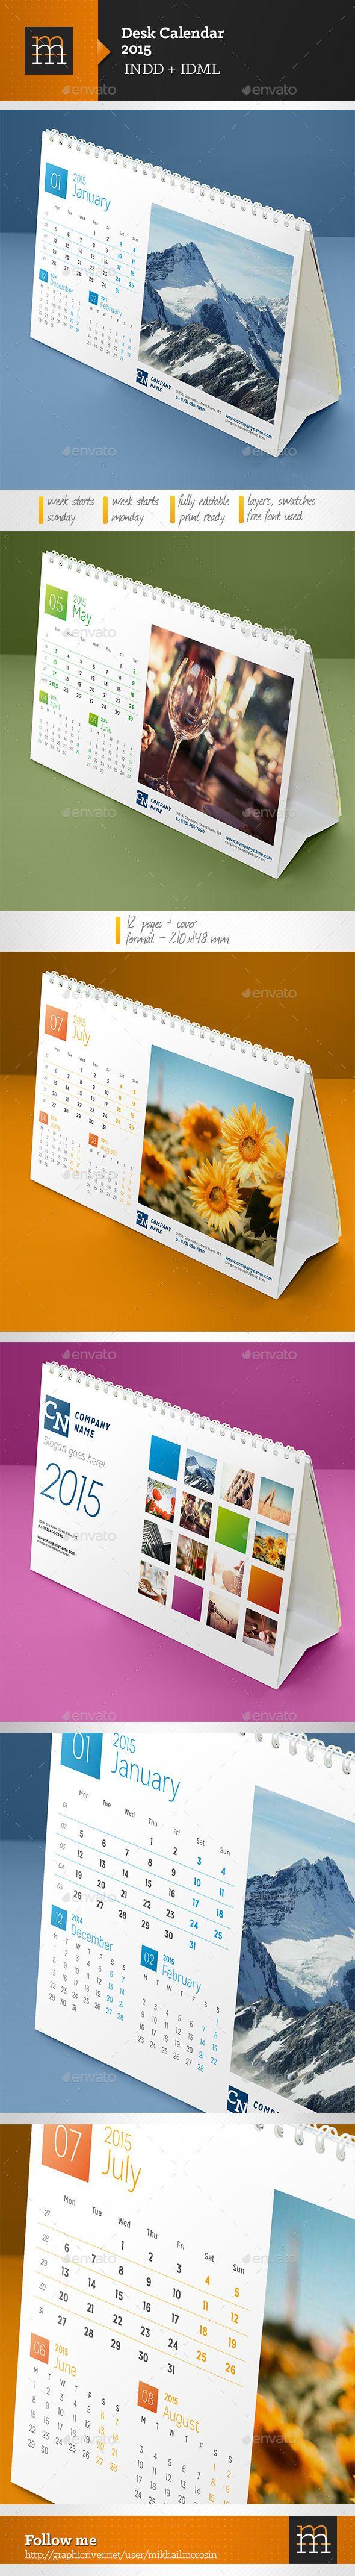 Desk Calendar 2015 Template | Buy and Download: http://graphicriver.net/item/desk-calendar-2015/8861786?ref=ksioks